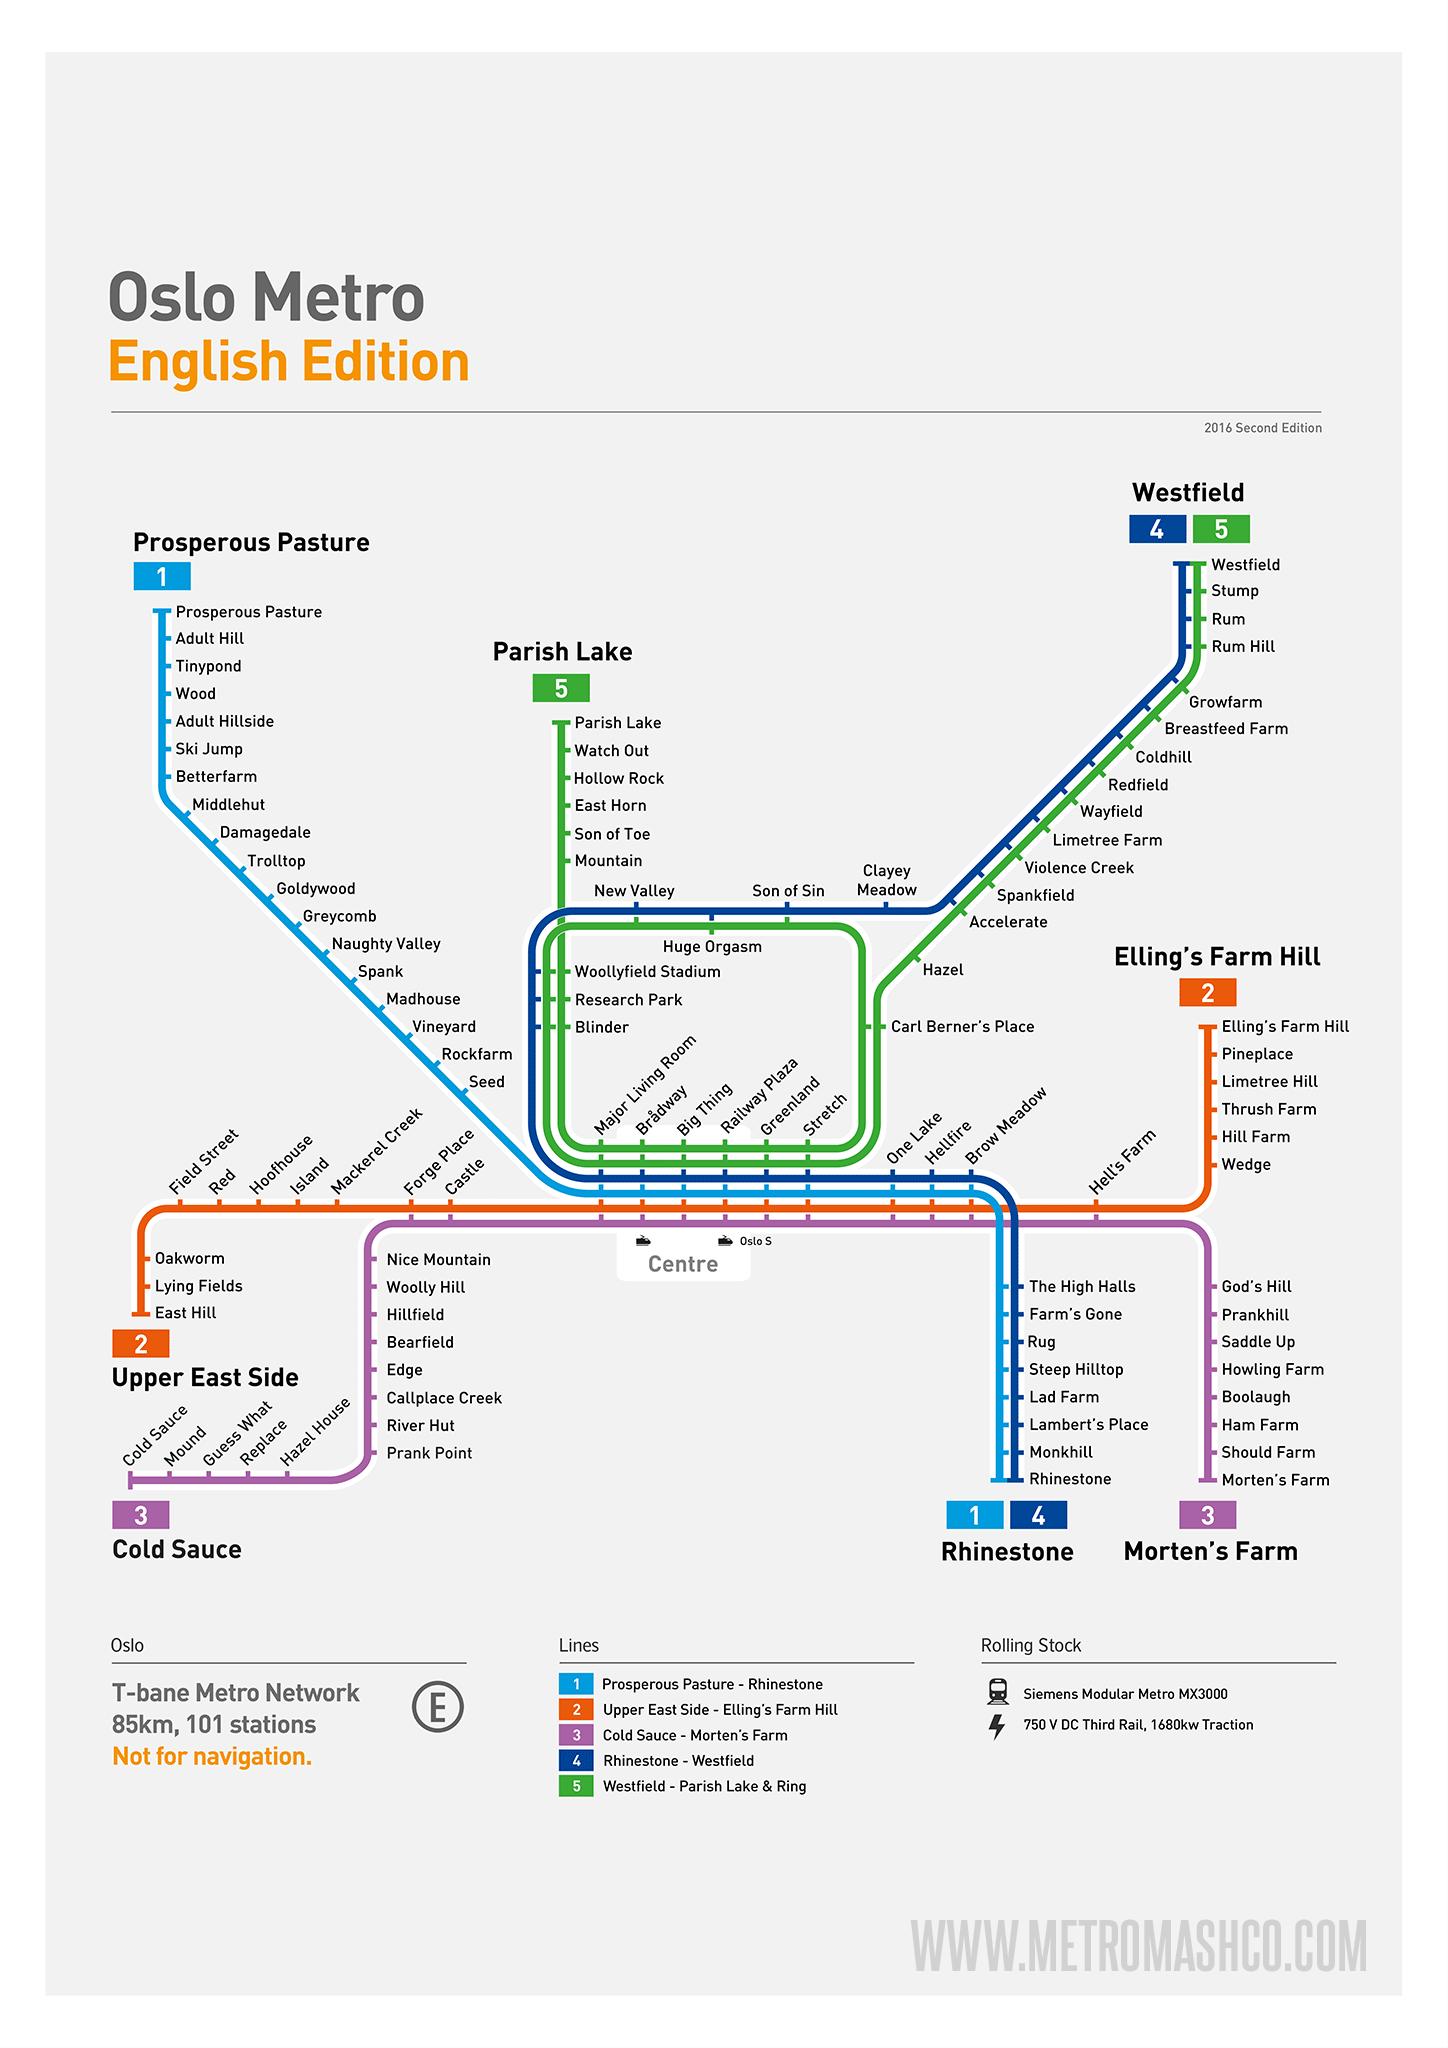 Oslo Metro Map: Literal English Translation A2 Art Poster